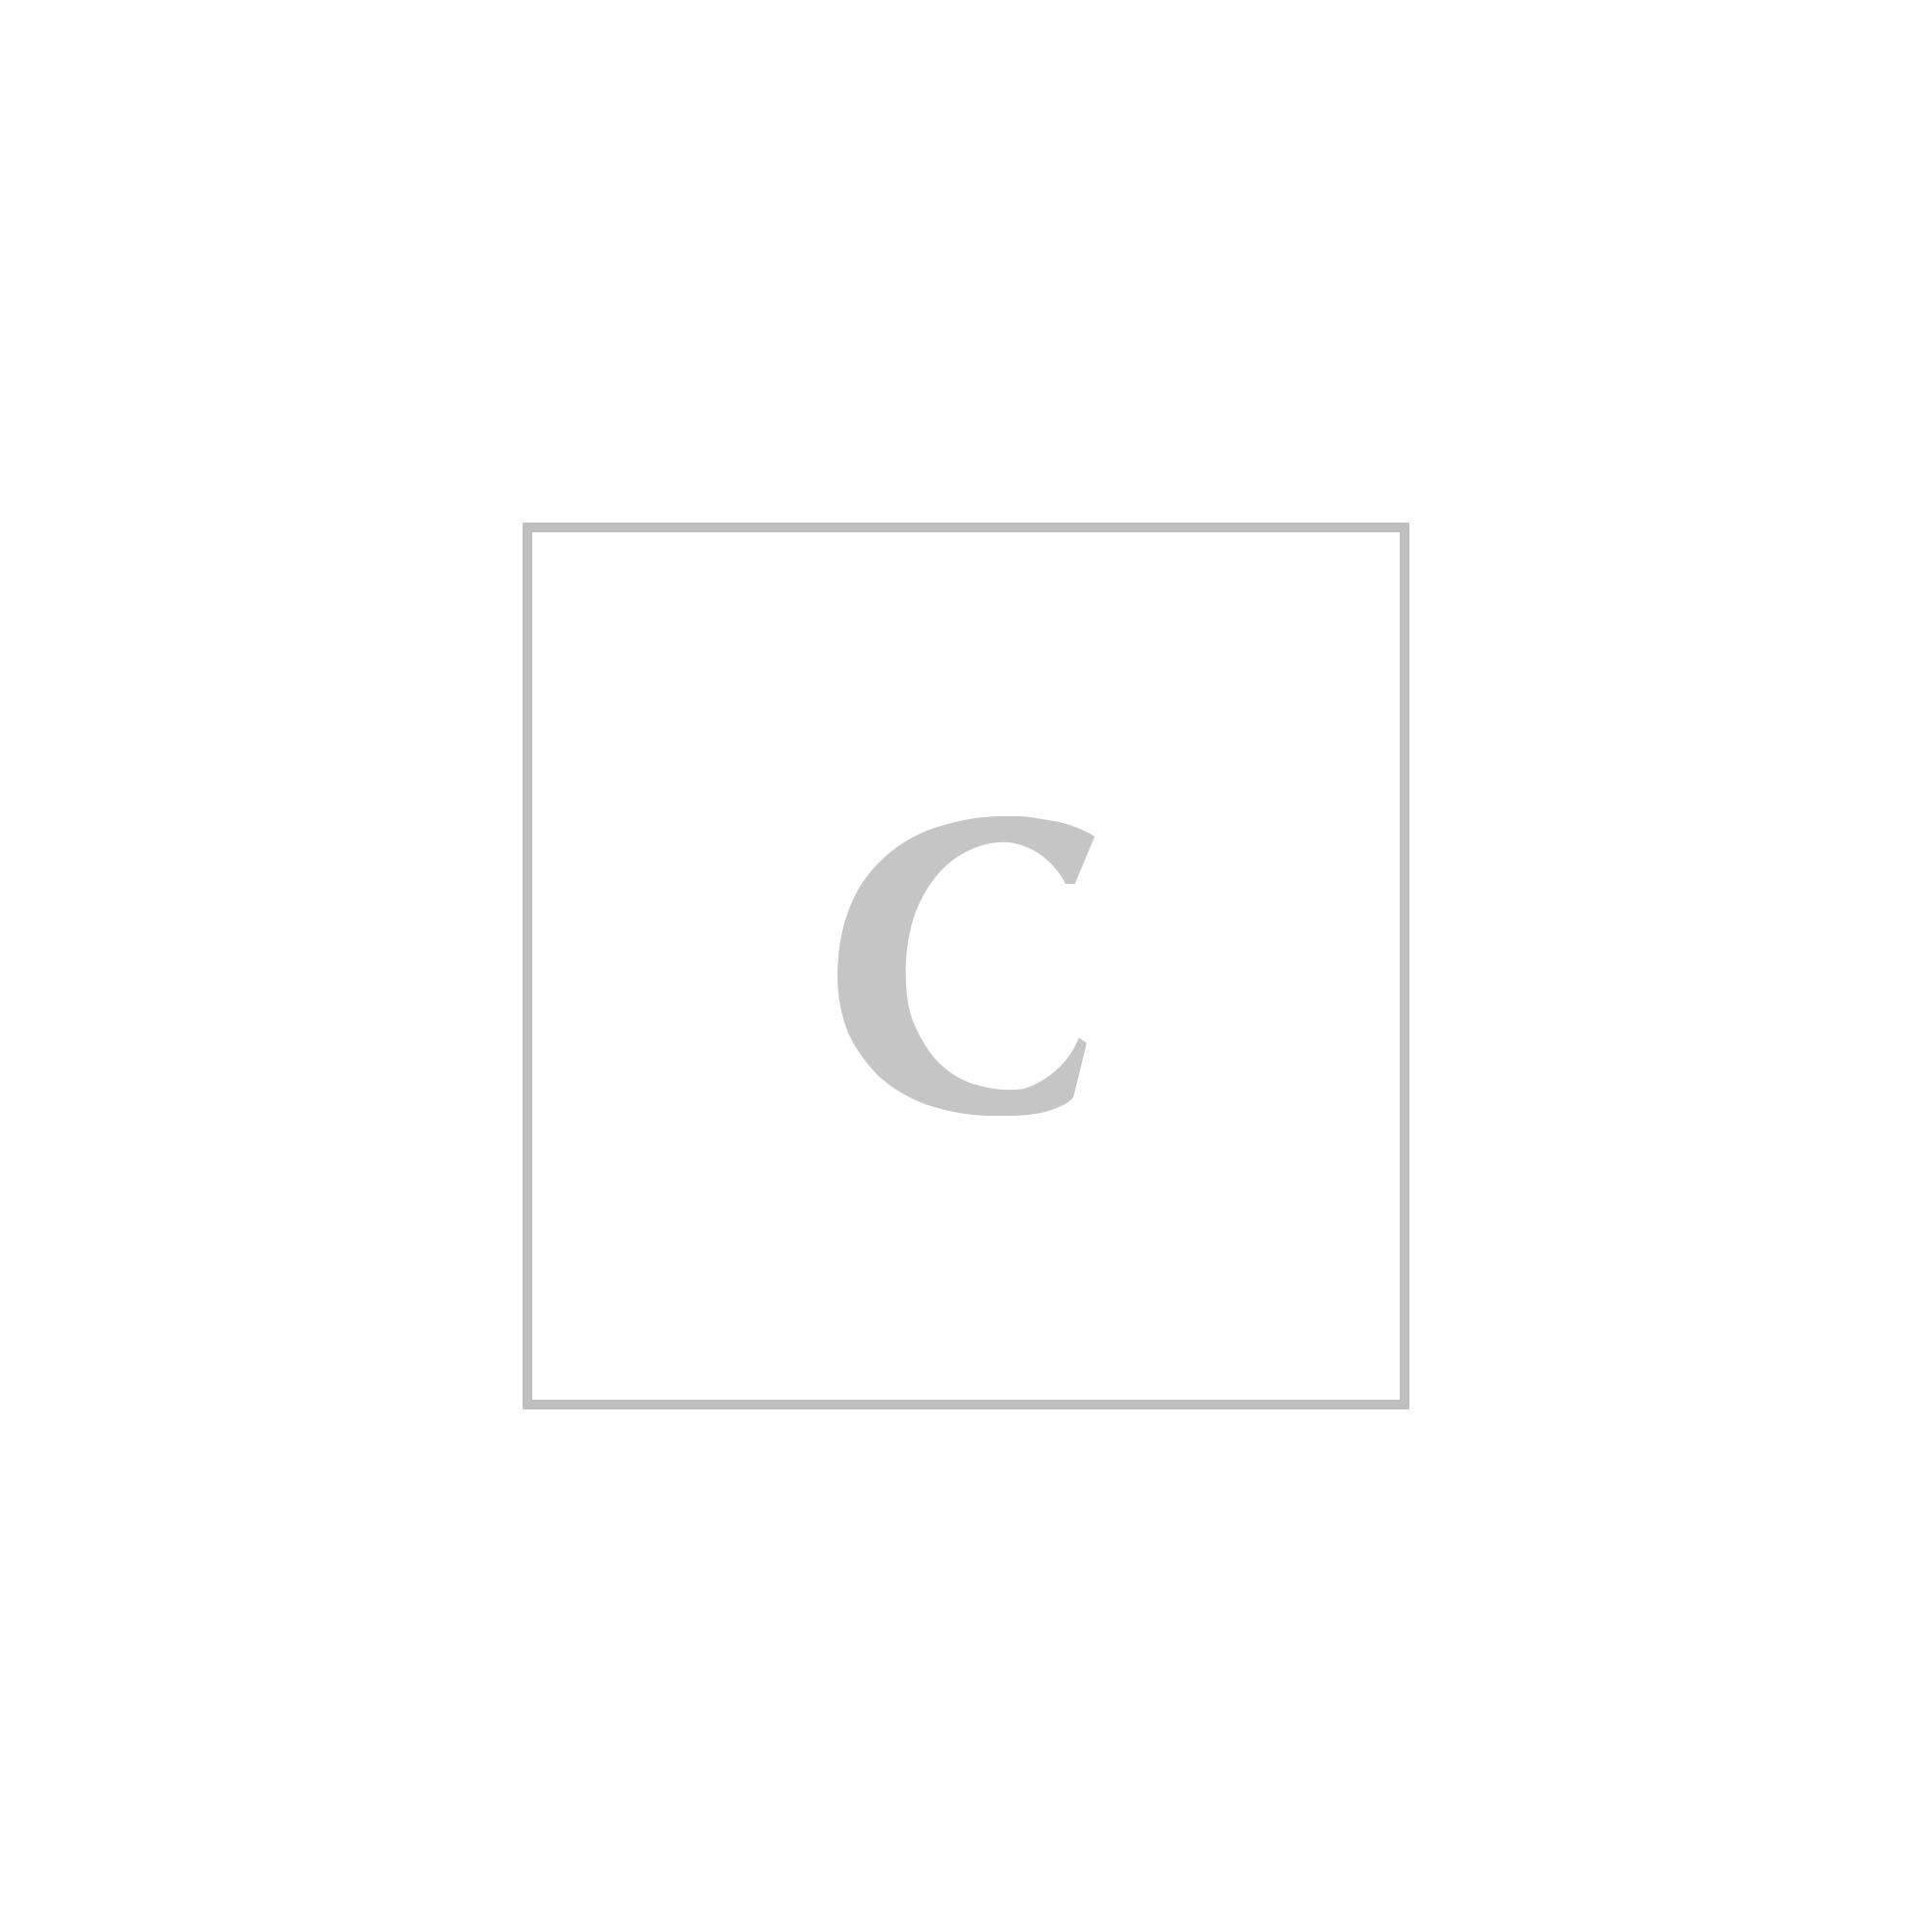 Stella mccartney borsa clutch metallic crackl